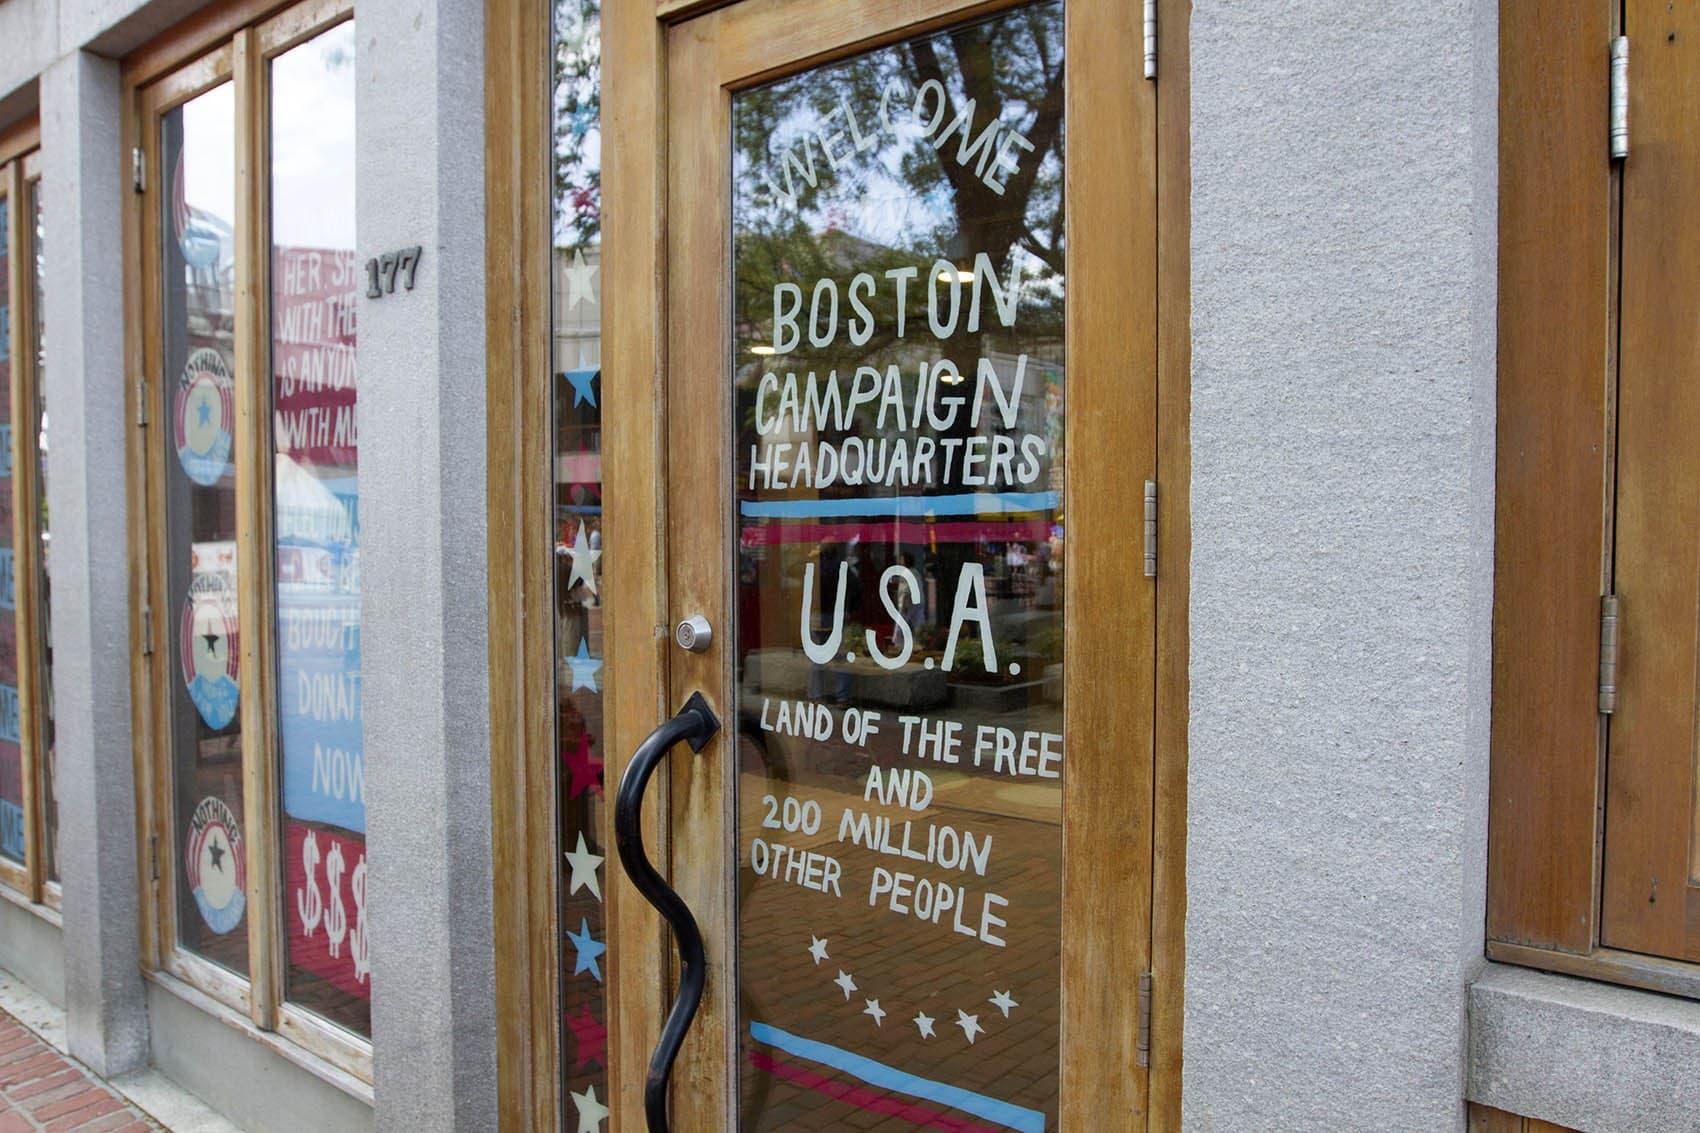 Artist Pat Falco's faux Boston Campaign Headquarters meant to poke fun at election season. (Joe Difazio for WBUR)